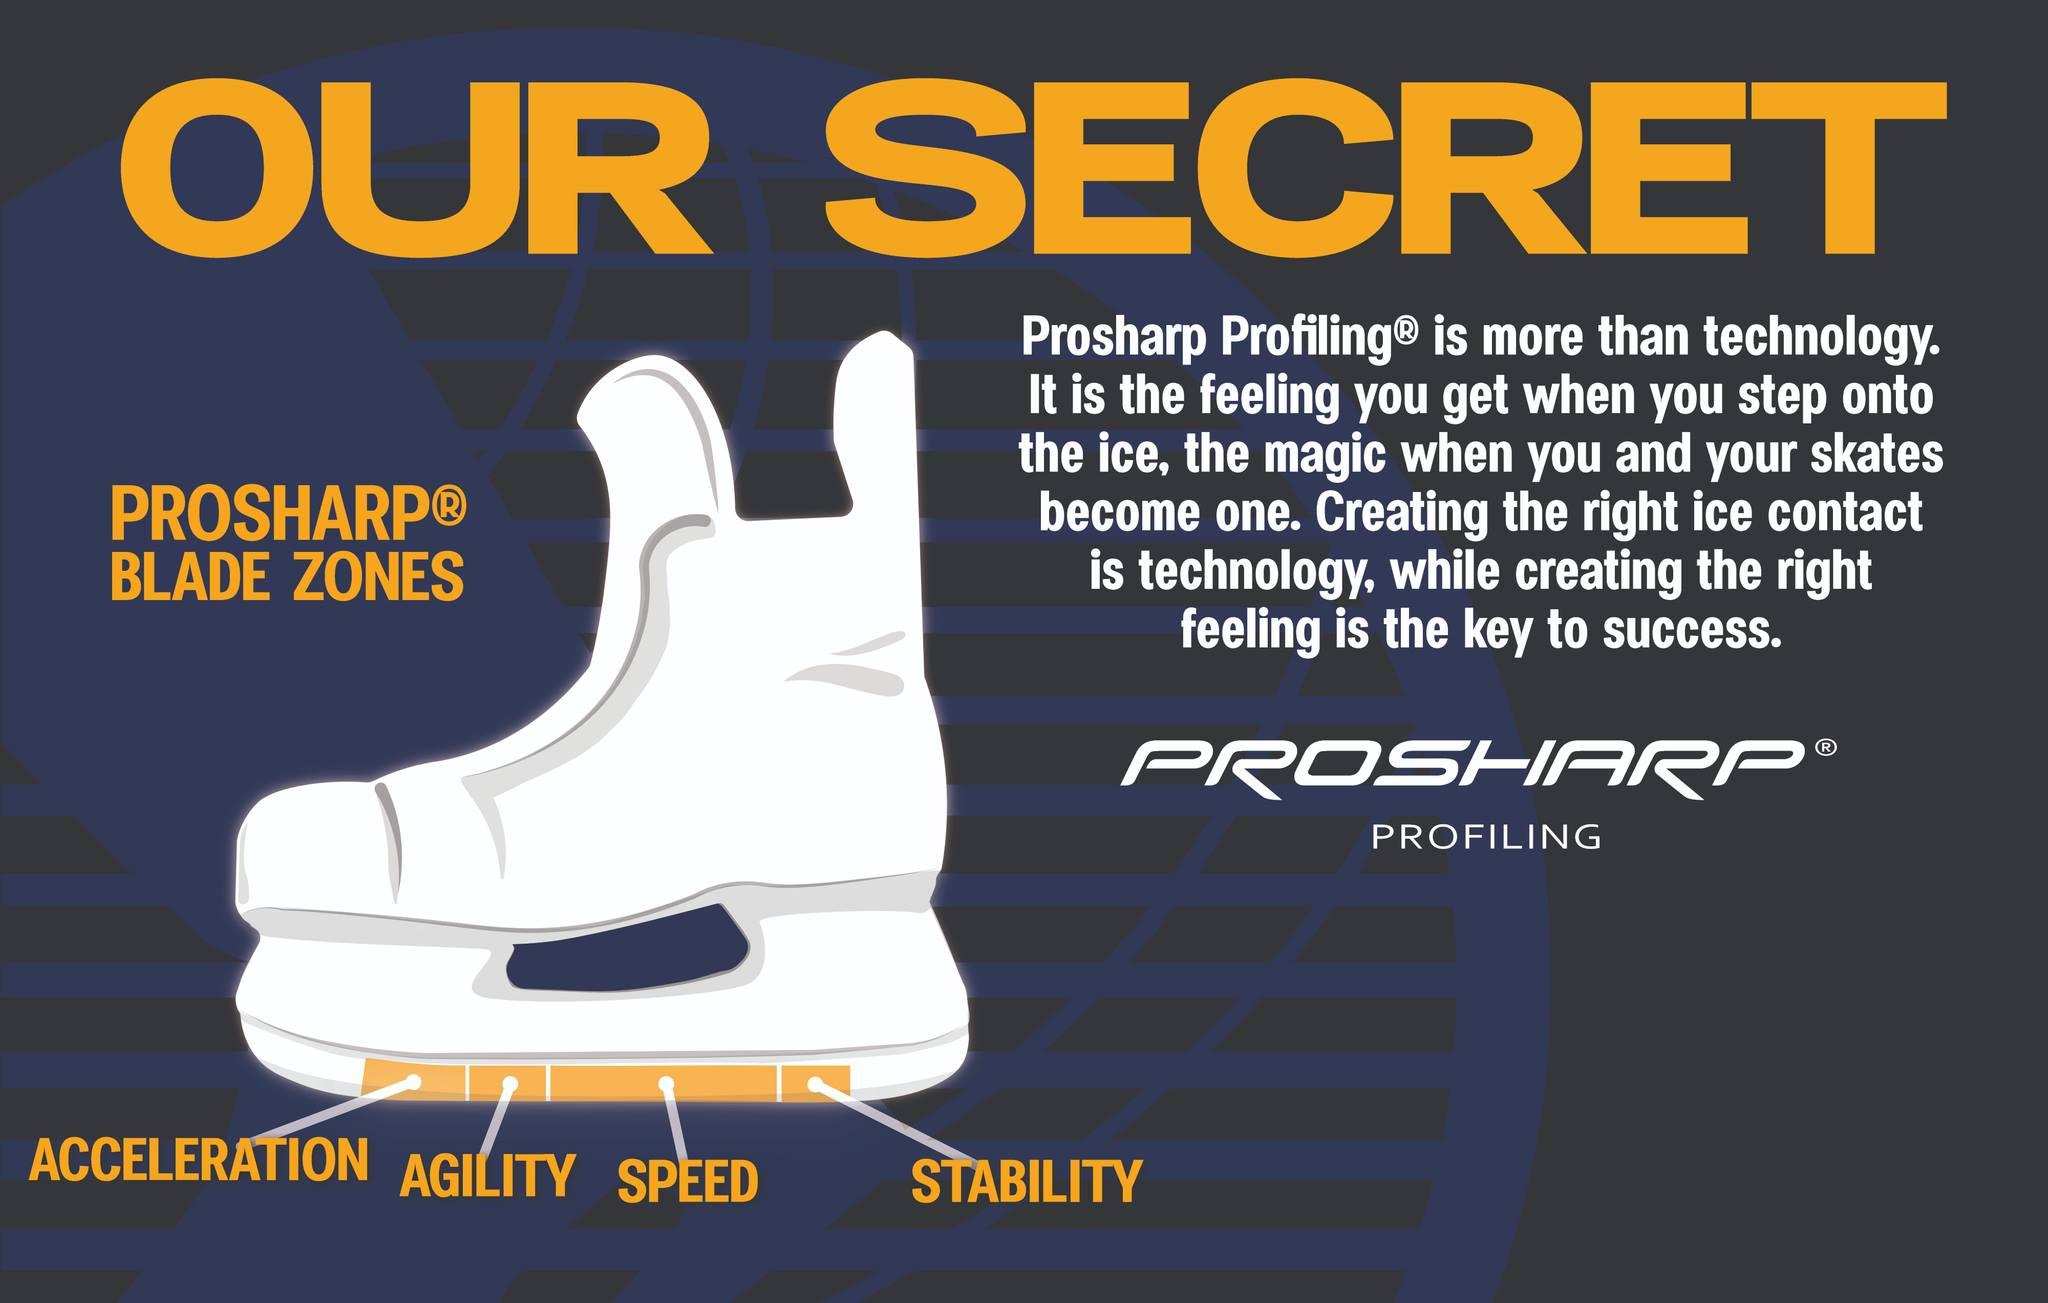 Prosharp Blade Zones